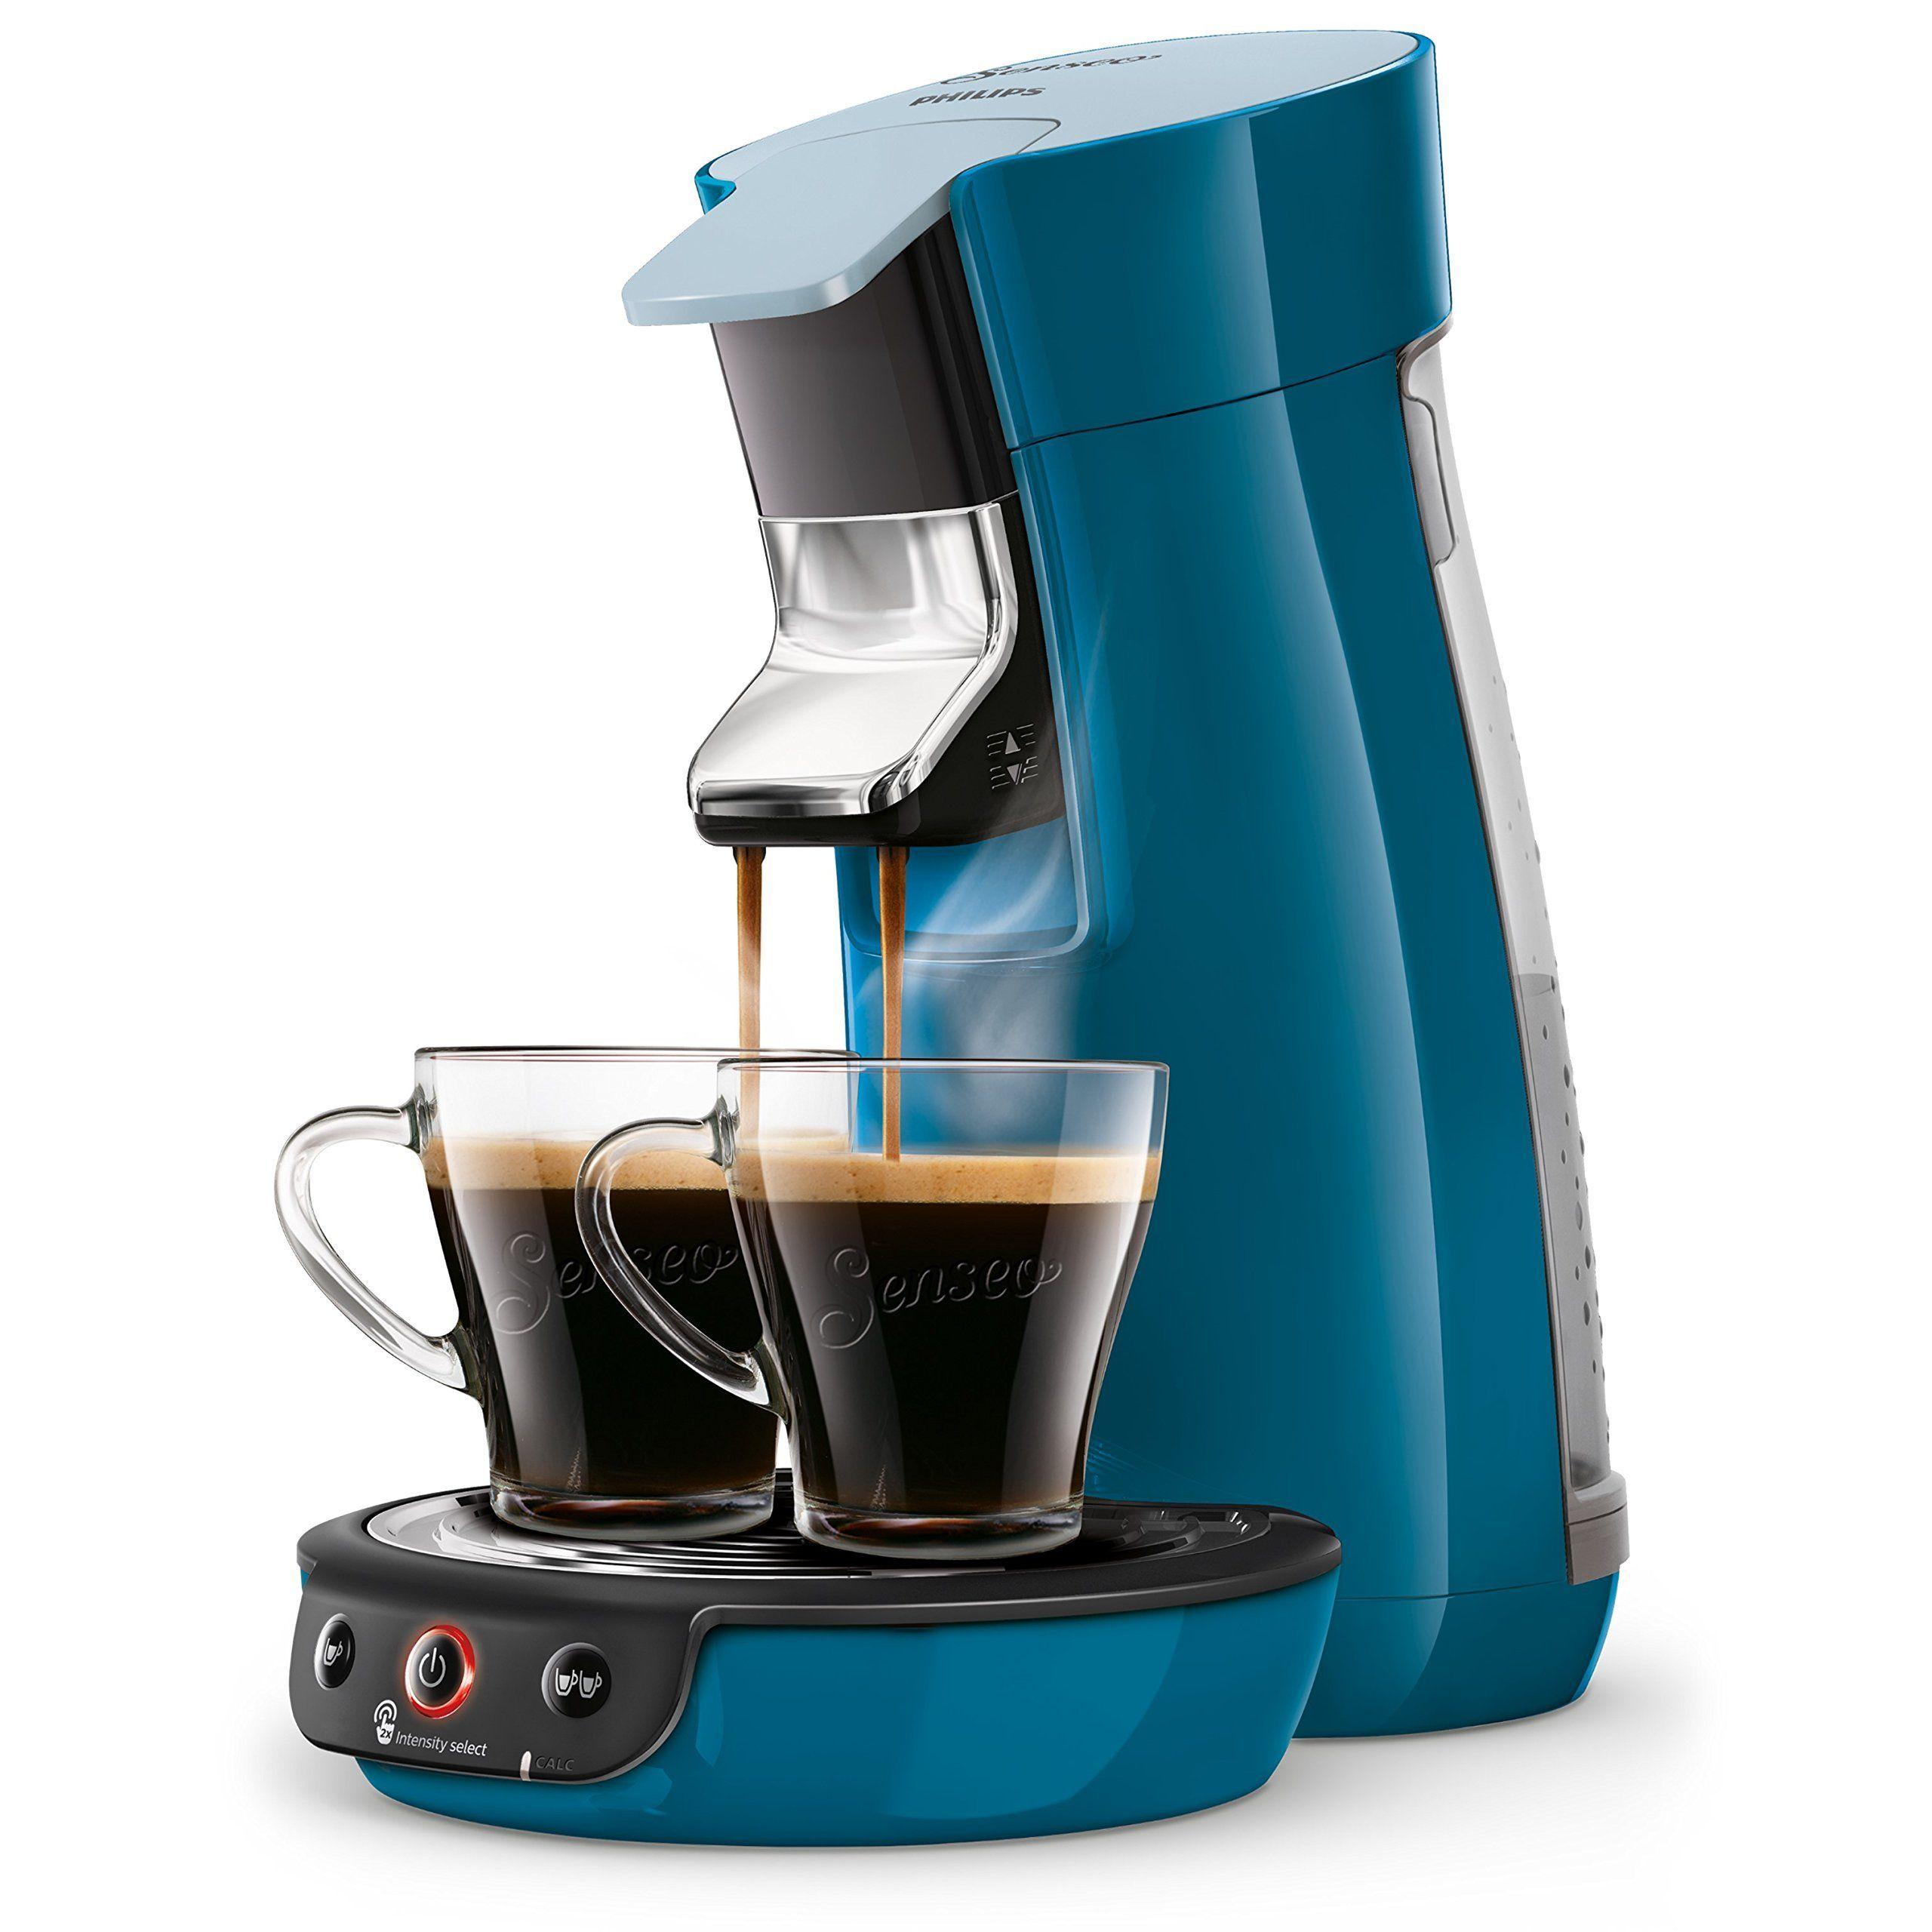 Philips Machine A Cafe A Dosettes Senseo Viva Cafe Pod Coffee Machine Miele Coffee Machine Coffee Maker Machine